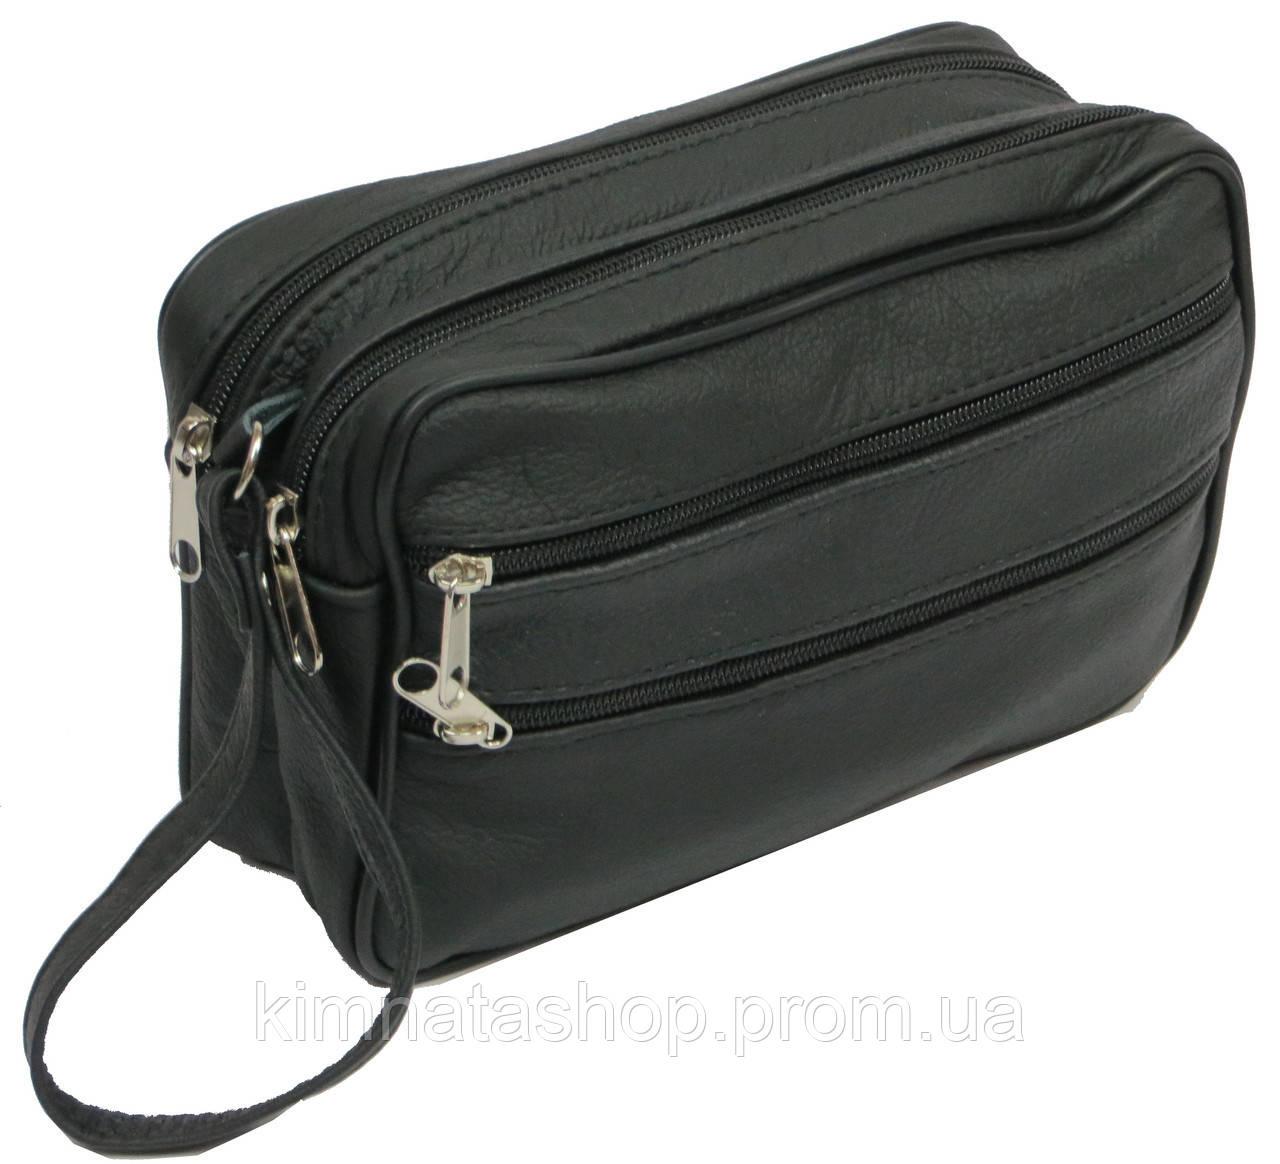 Мужская кожаная сумка-борсетка 41393 Andrzej черный, 22х14х7 см.